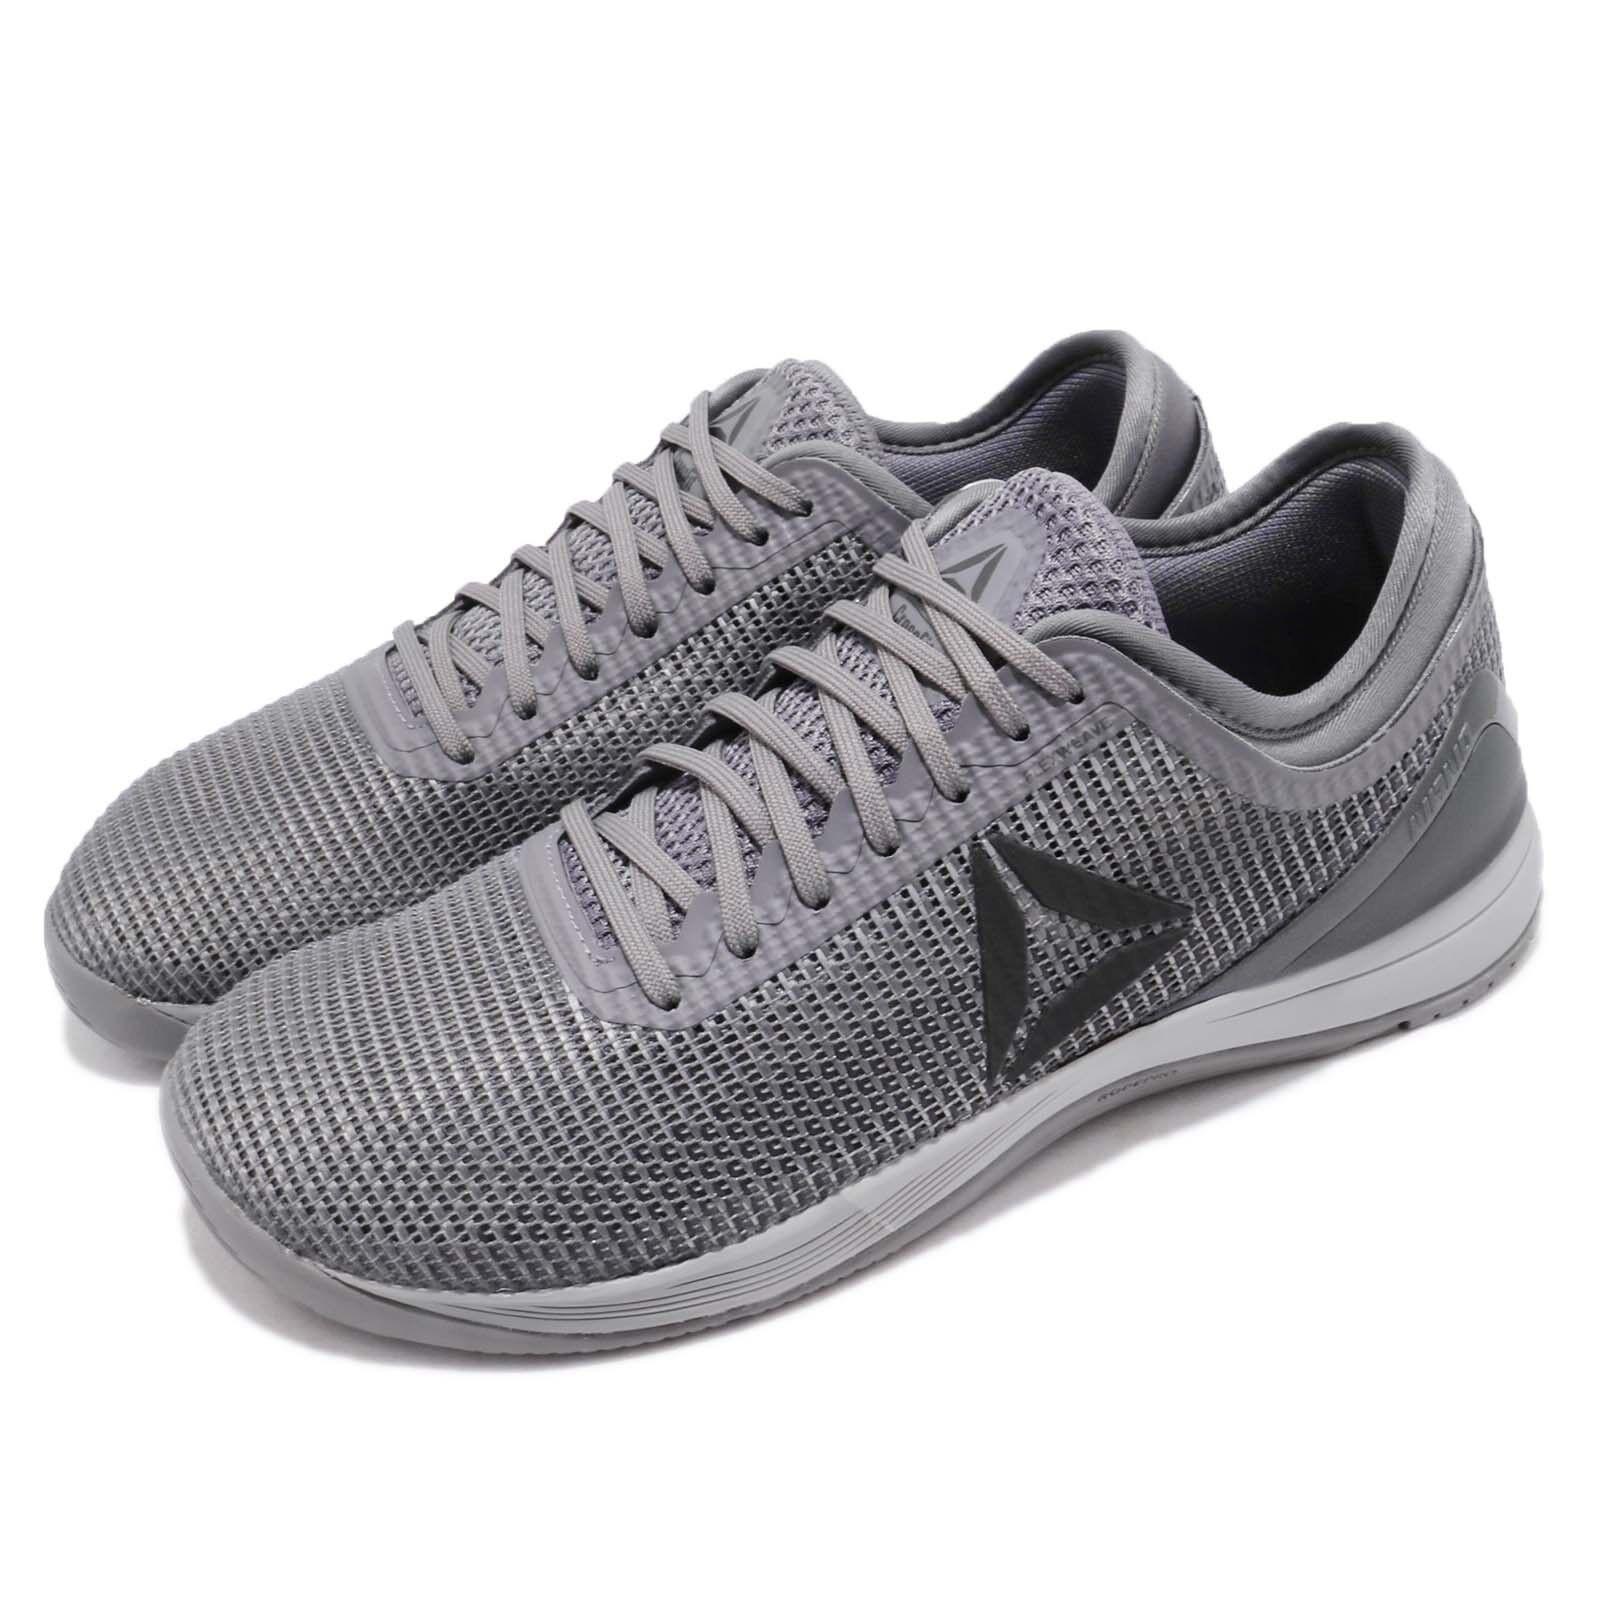 Reebok R CrossFit  Nano 8.0 grigio Dark argento Men Cross Training scarpe CN2976  articoli promozionali